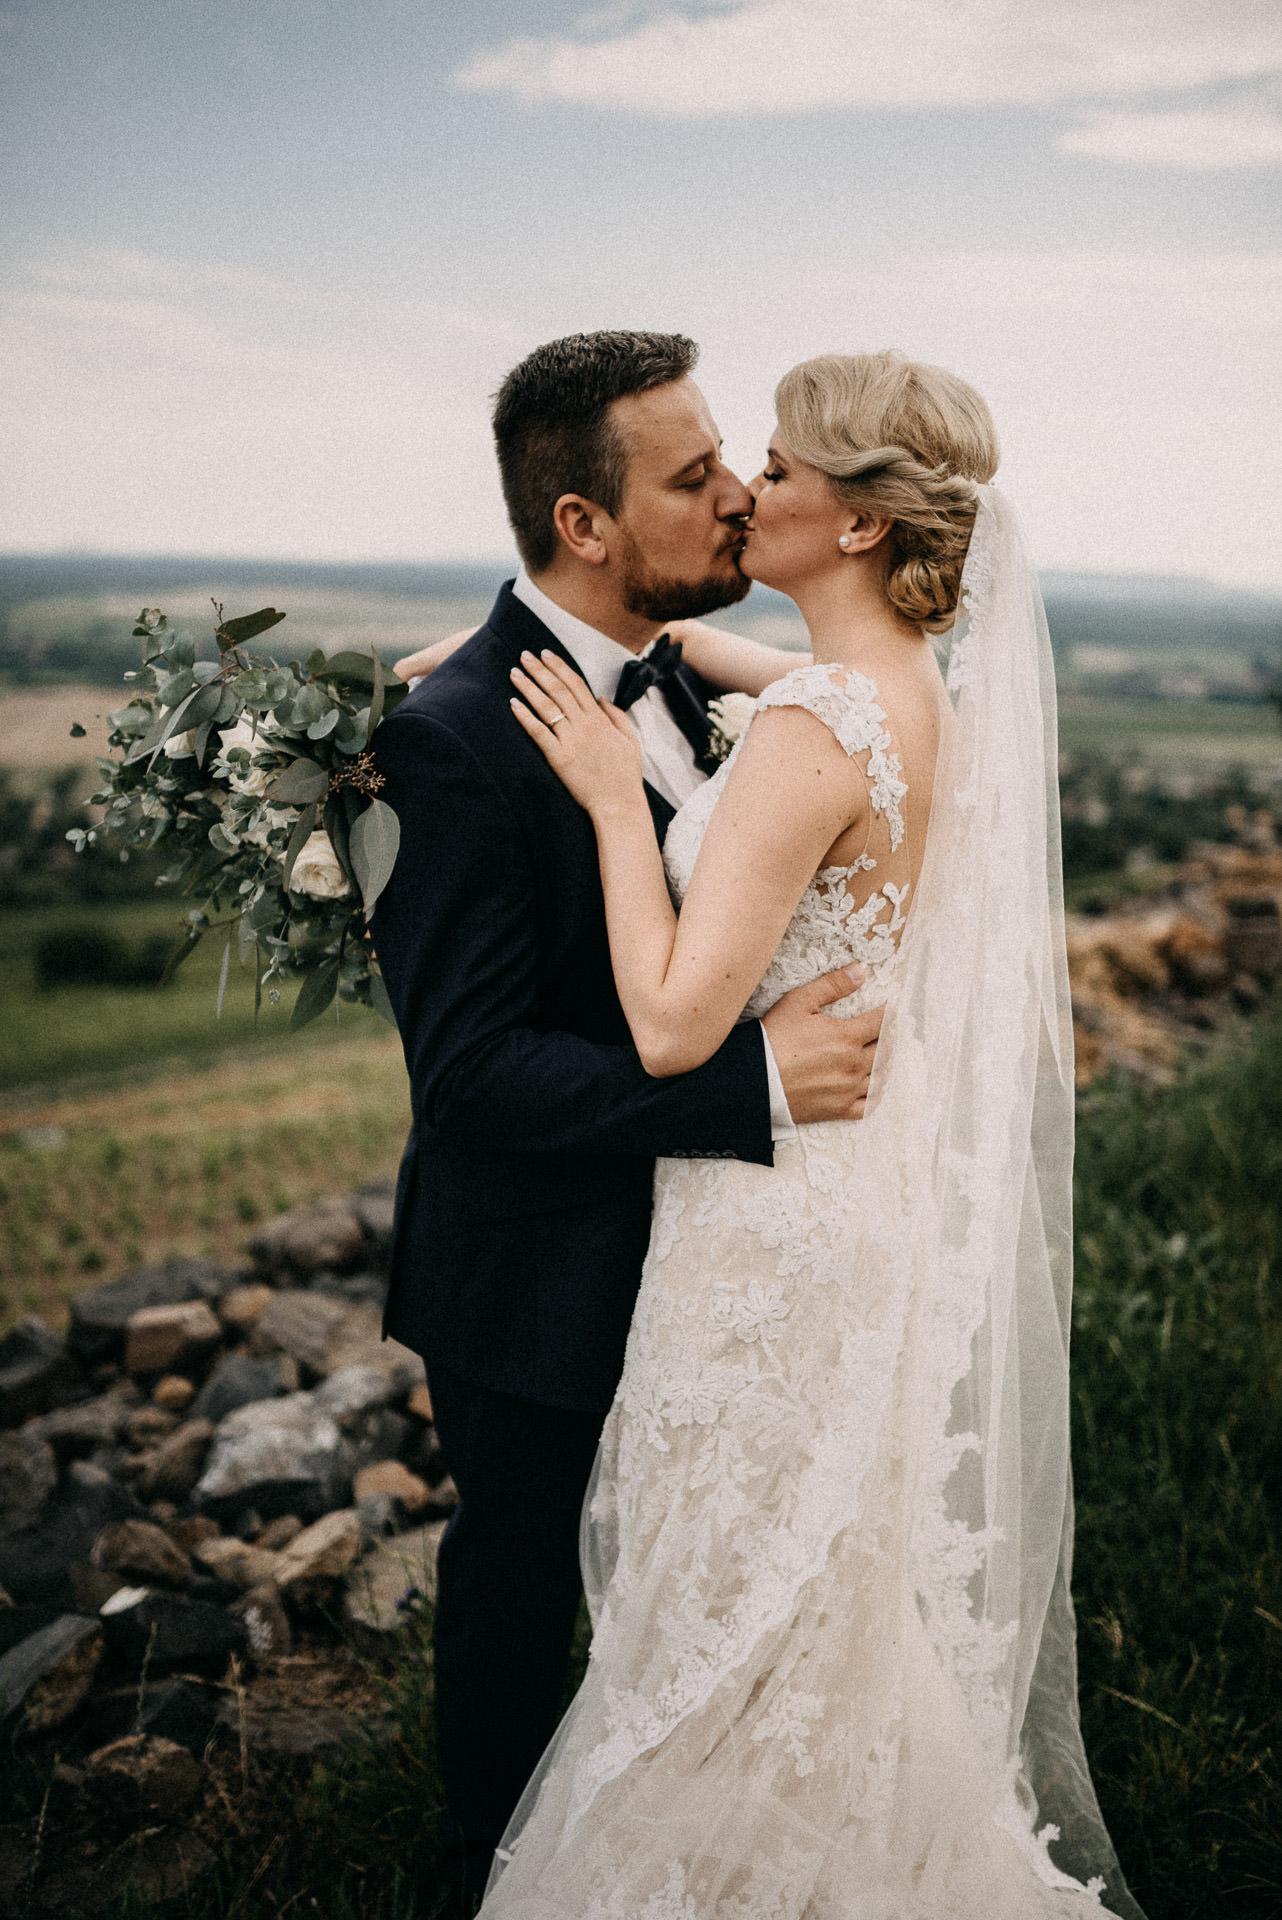 oleles menyasszony volegeny csok embrace bride groom